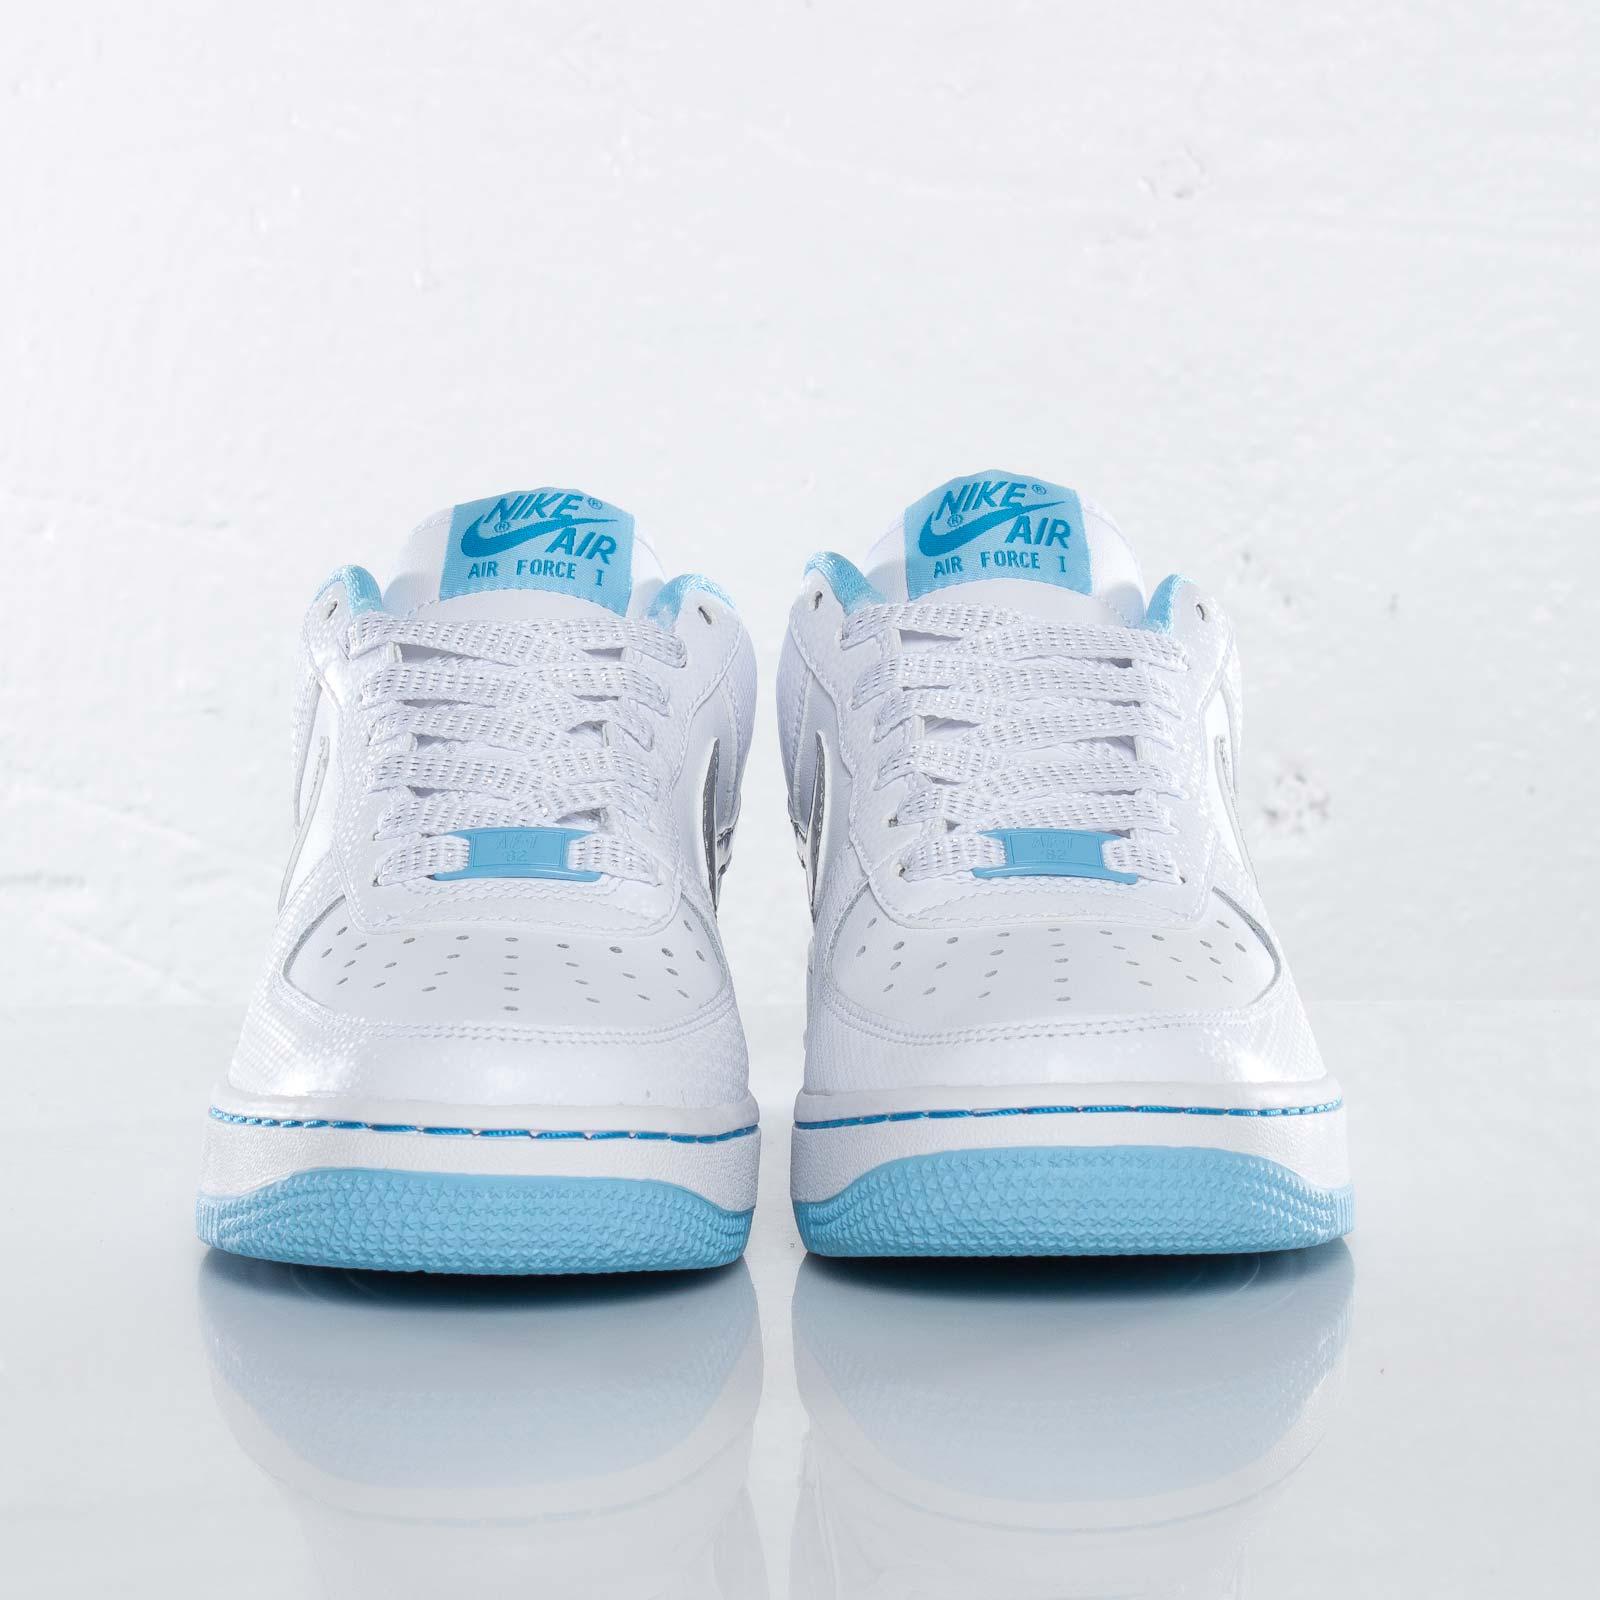 online retailer a5320 6c553 Air 23 – Air Jordan Release Dates, Foamposite, Air Max, and More